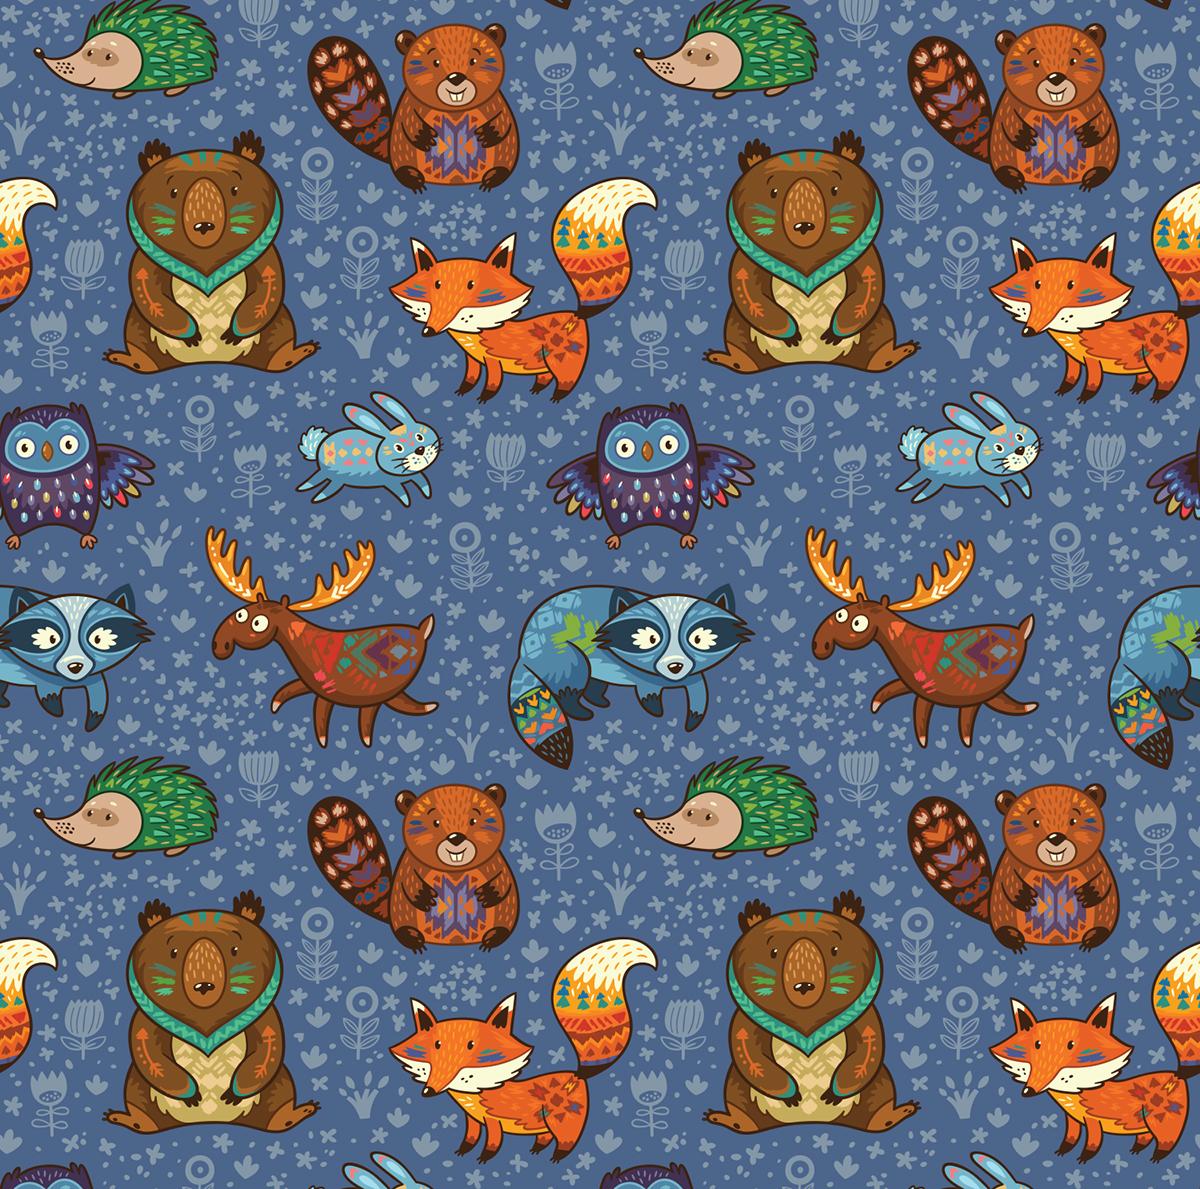 Forest animals pattern on